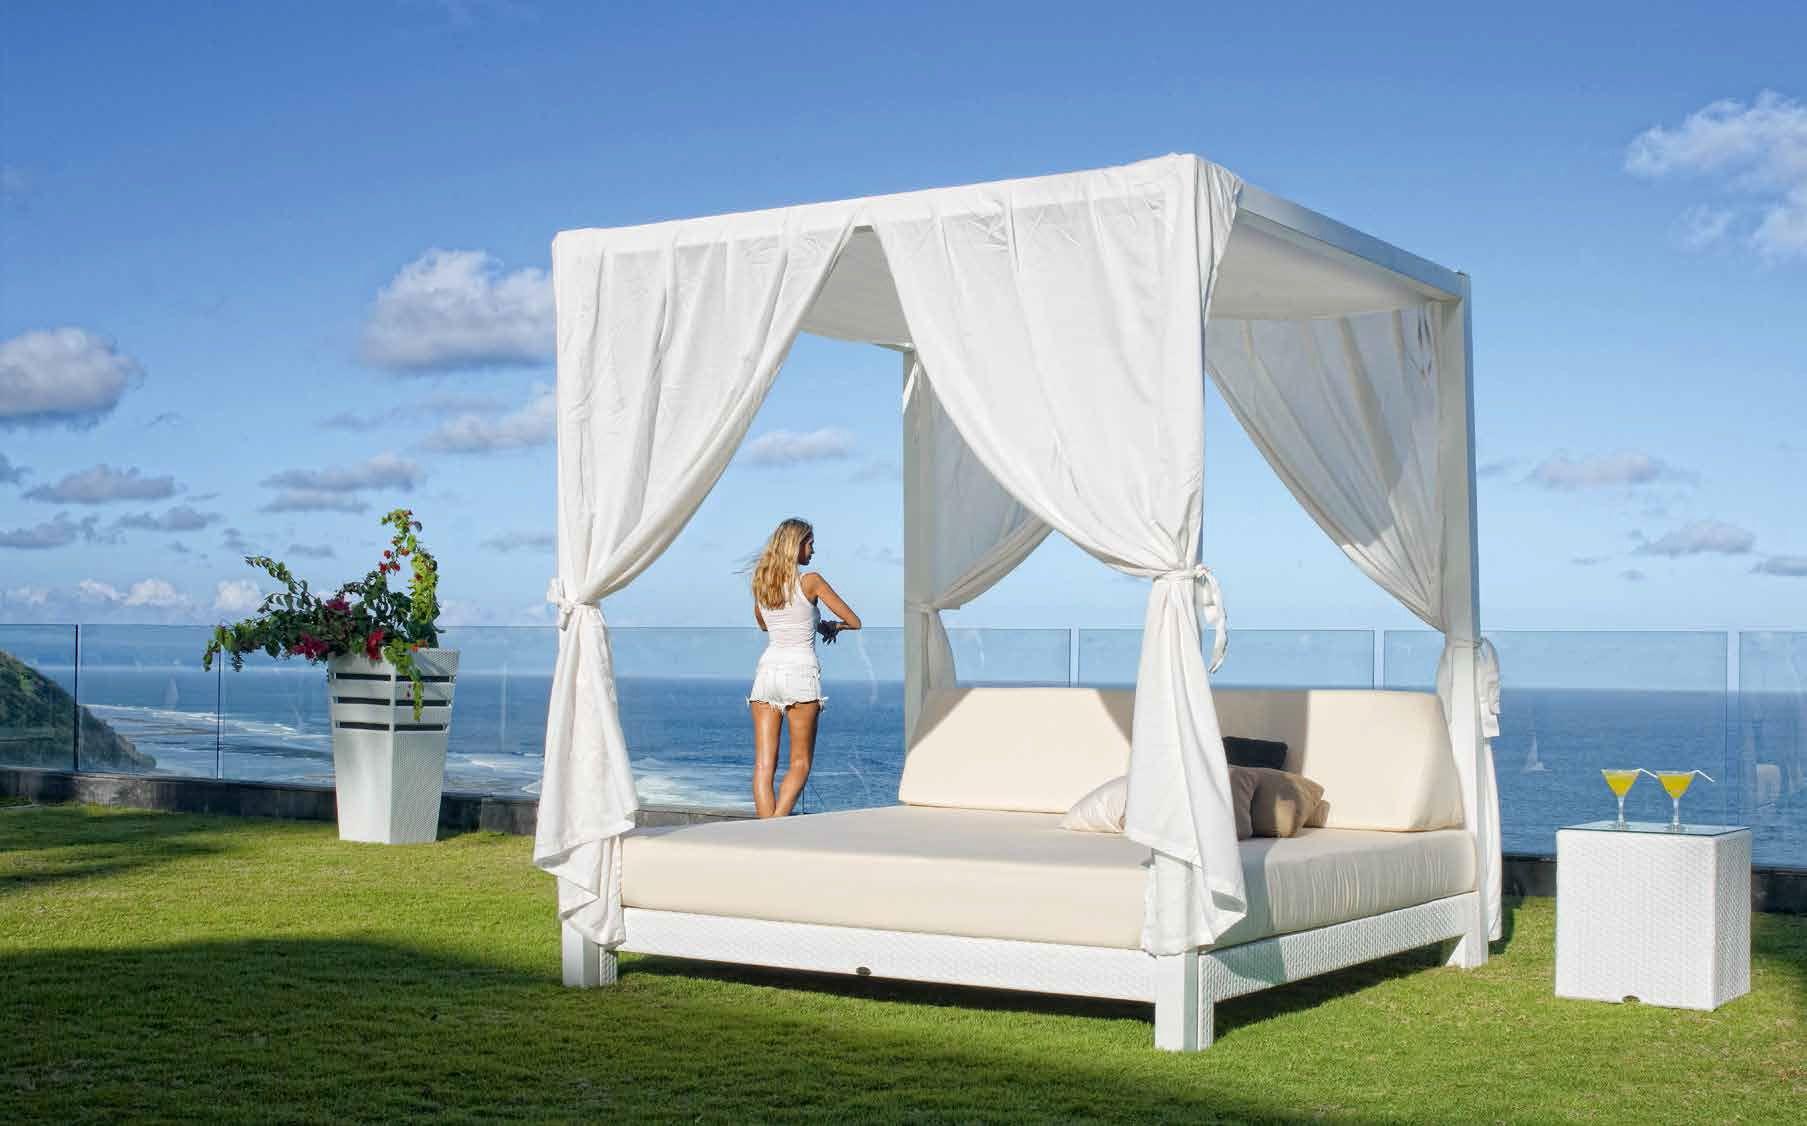 loopita bonita outdoor furniture. Patio Furniture, Balinese Bed - Cama Balinesa, Mobiliario De Exterior Loopita Bonita Outdoor Furniture